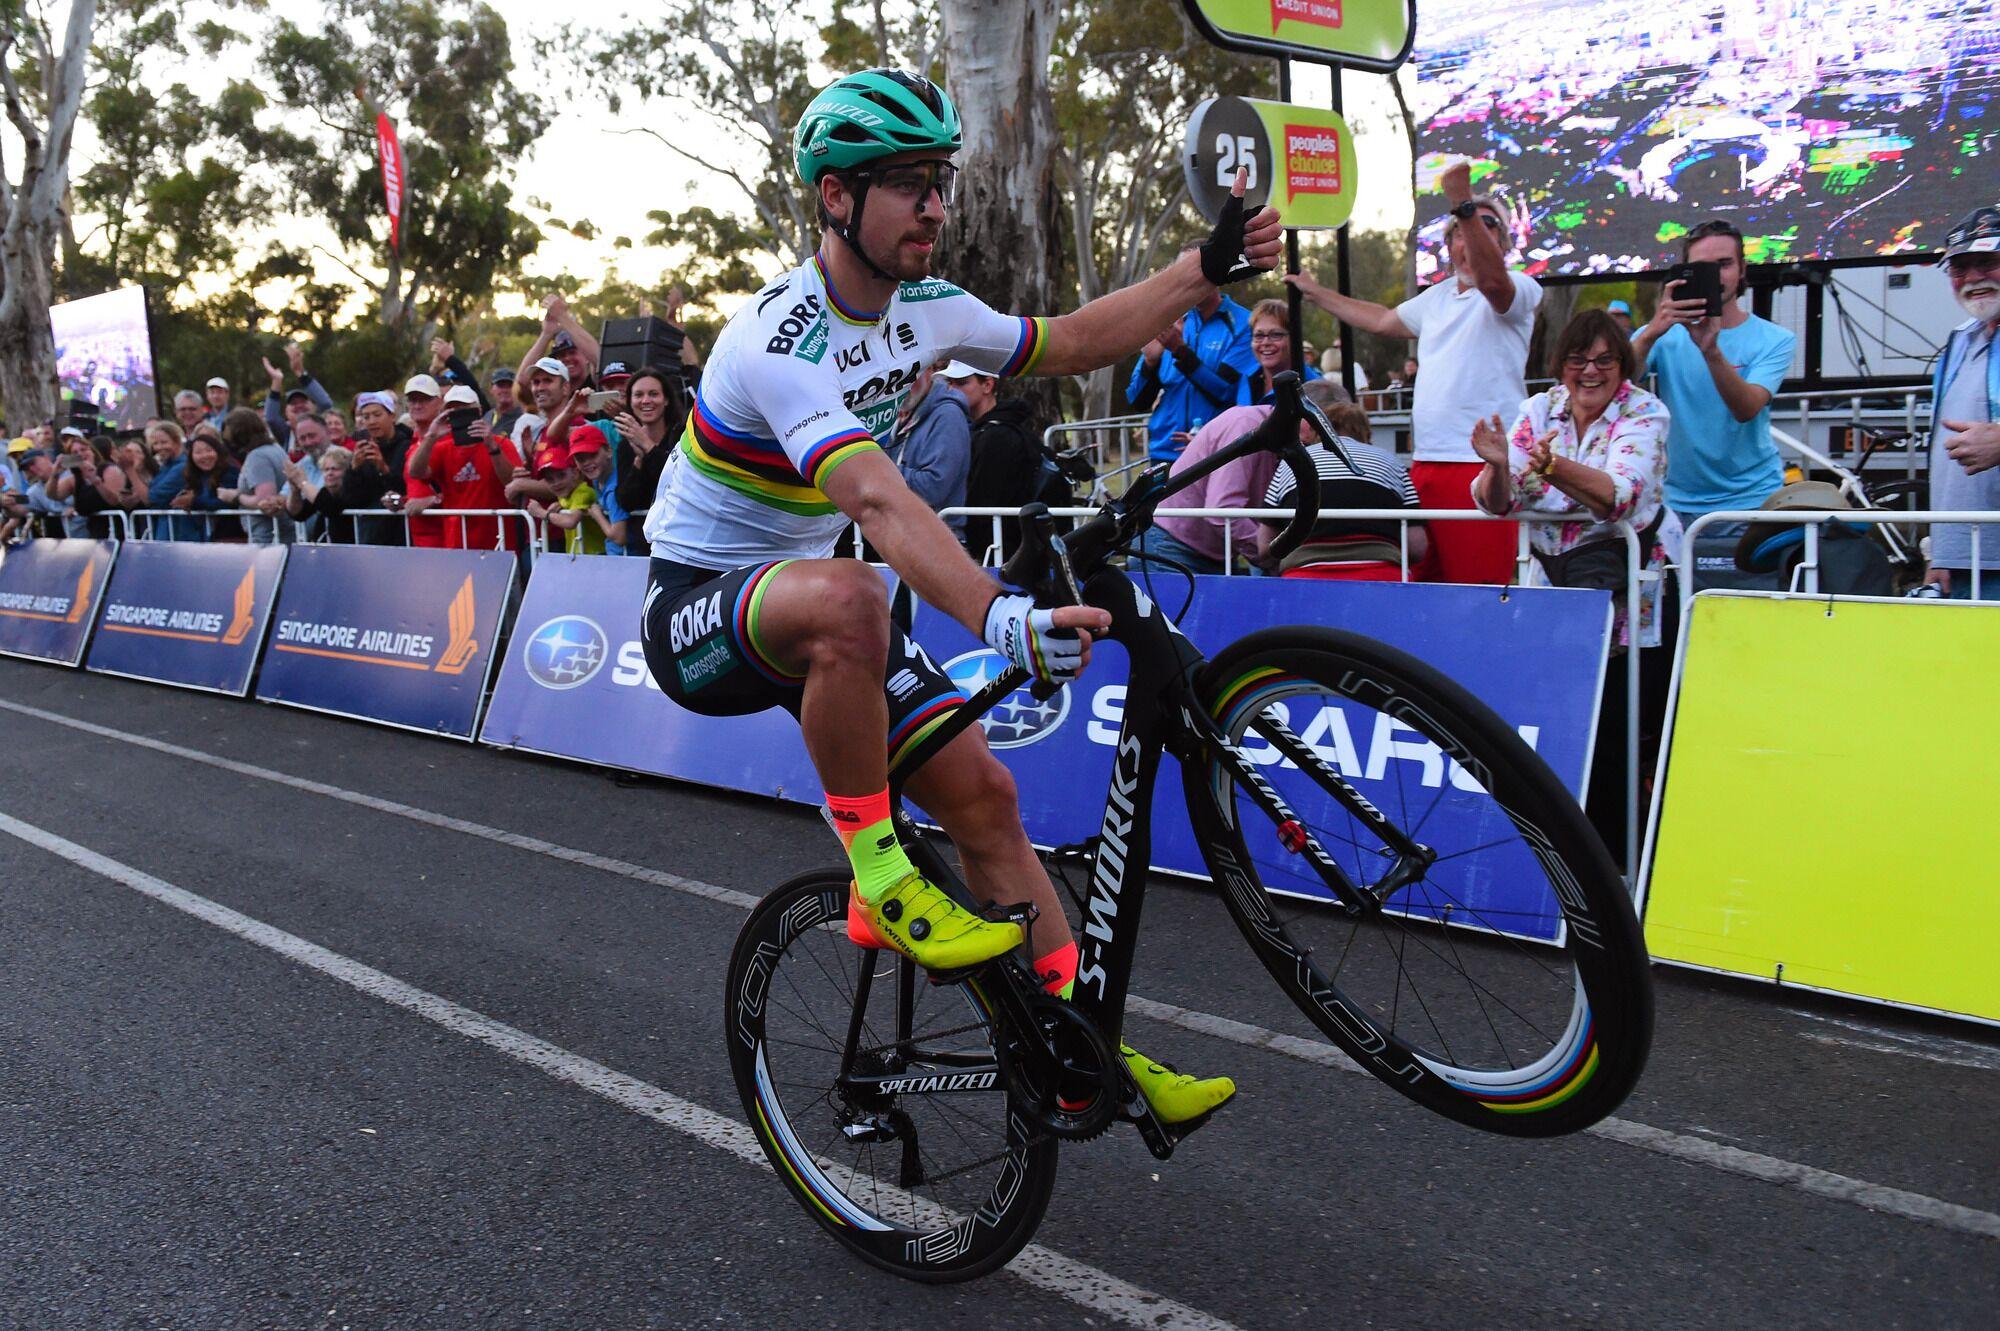 Peter Sagan ganando en Australia JoanSeguidor